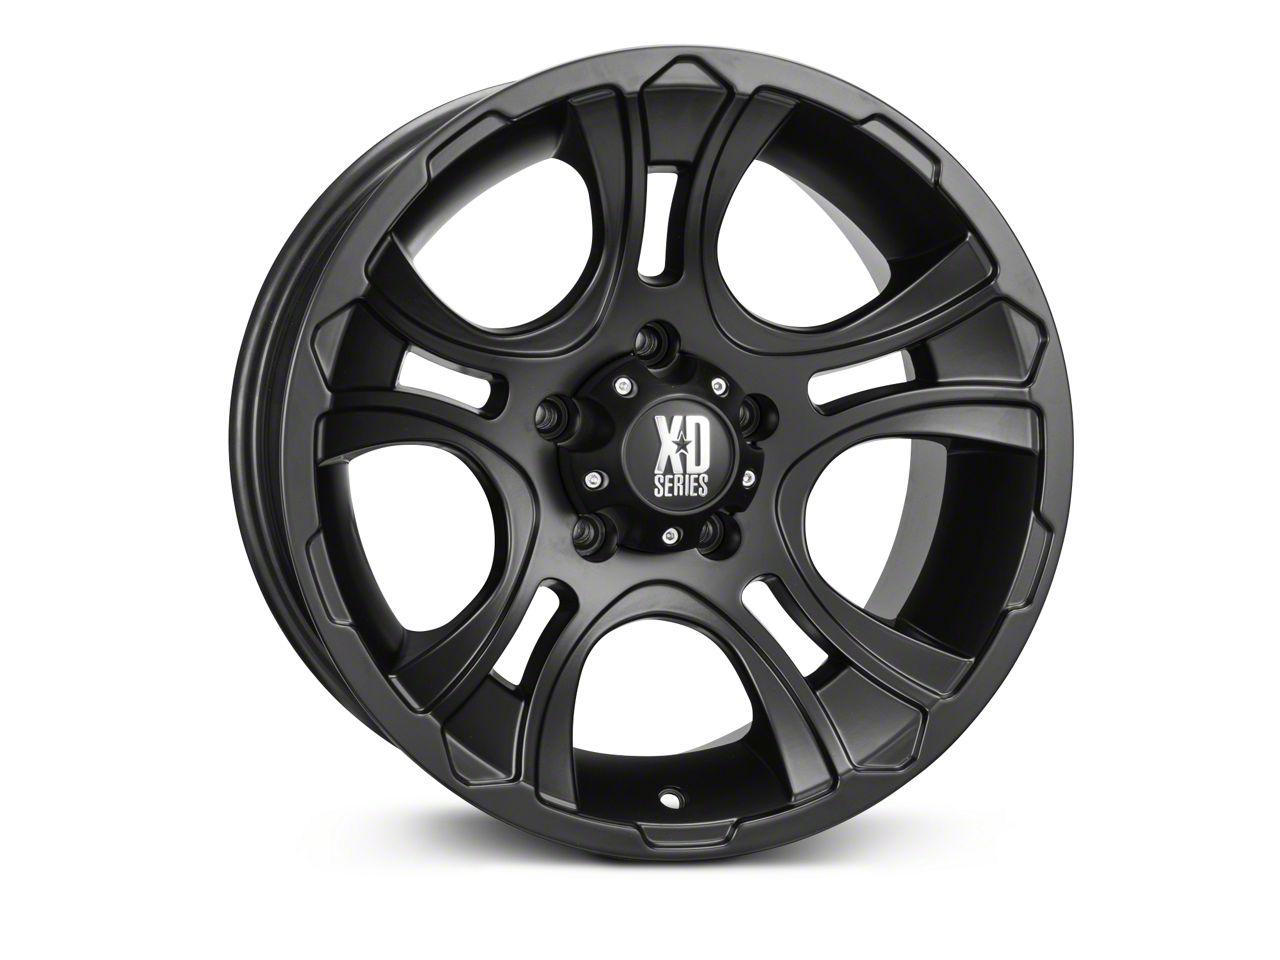 XD Crank Matte Black Wheel - 17x9 (07-18 Jeep Wrangler JK; 2018 Jeep Wrangler JL)